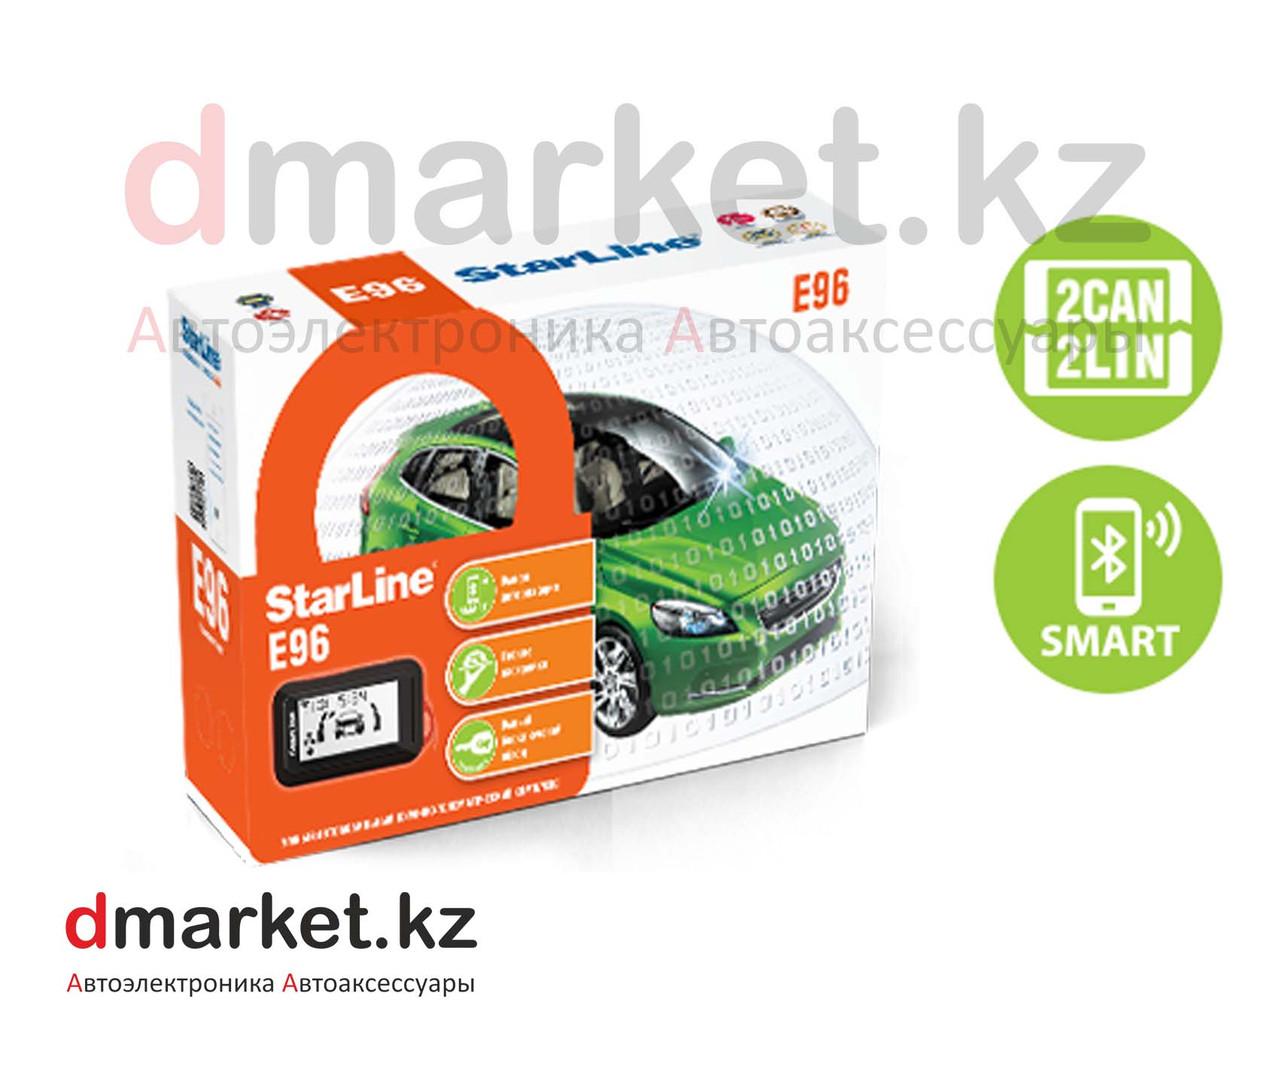 StarLine E96 BT, 2CAN-2LIN, Bluetooth, брелок-метка, автозавод, авторизация через телефон